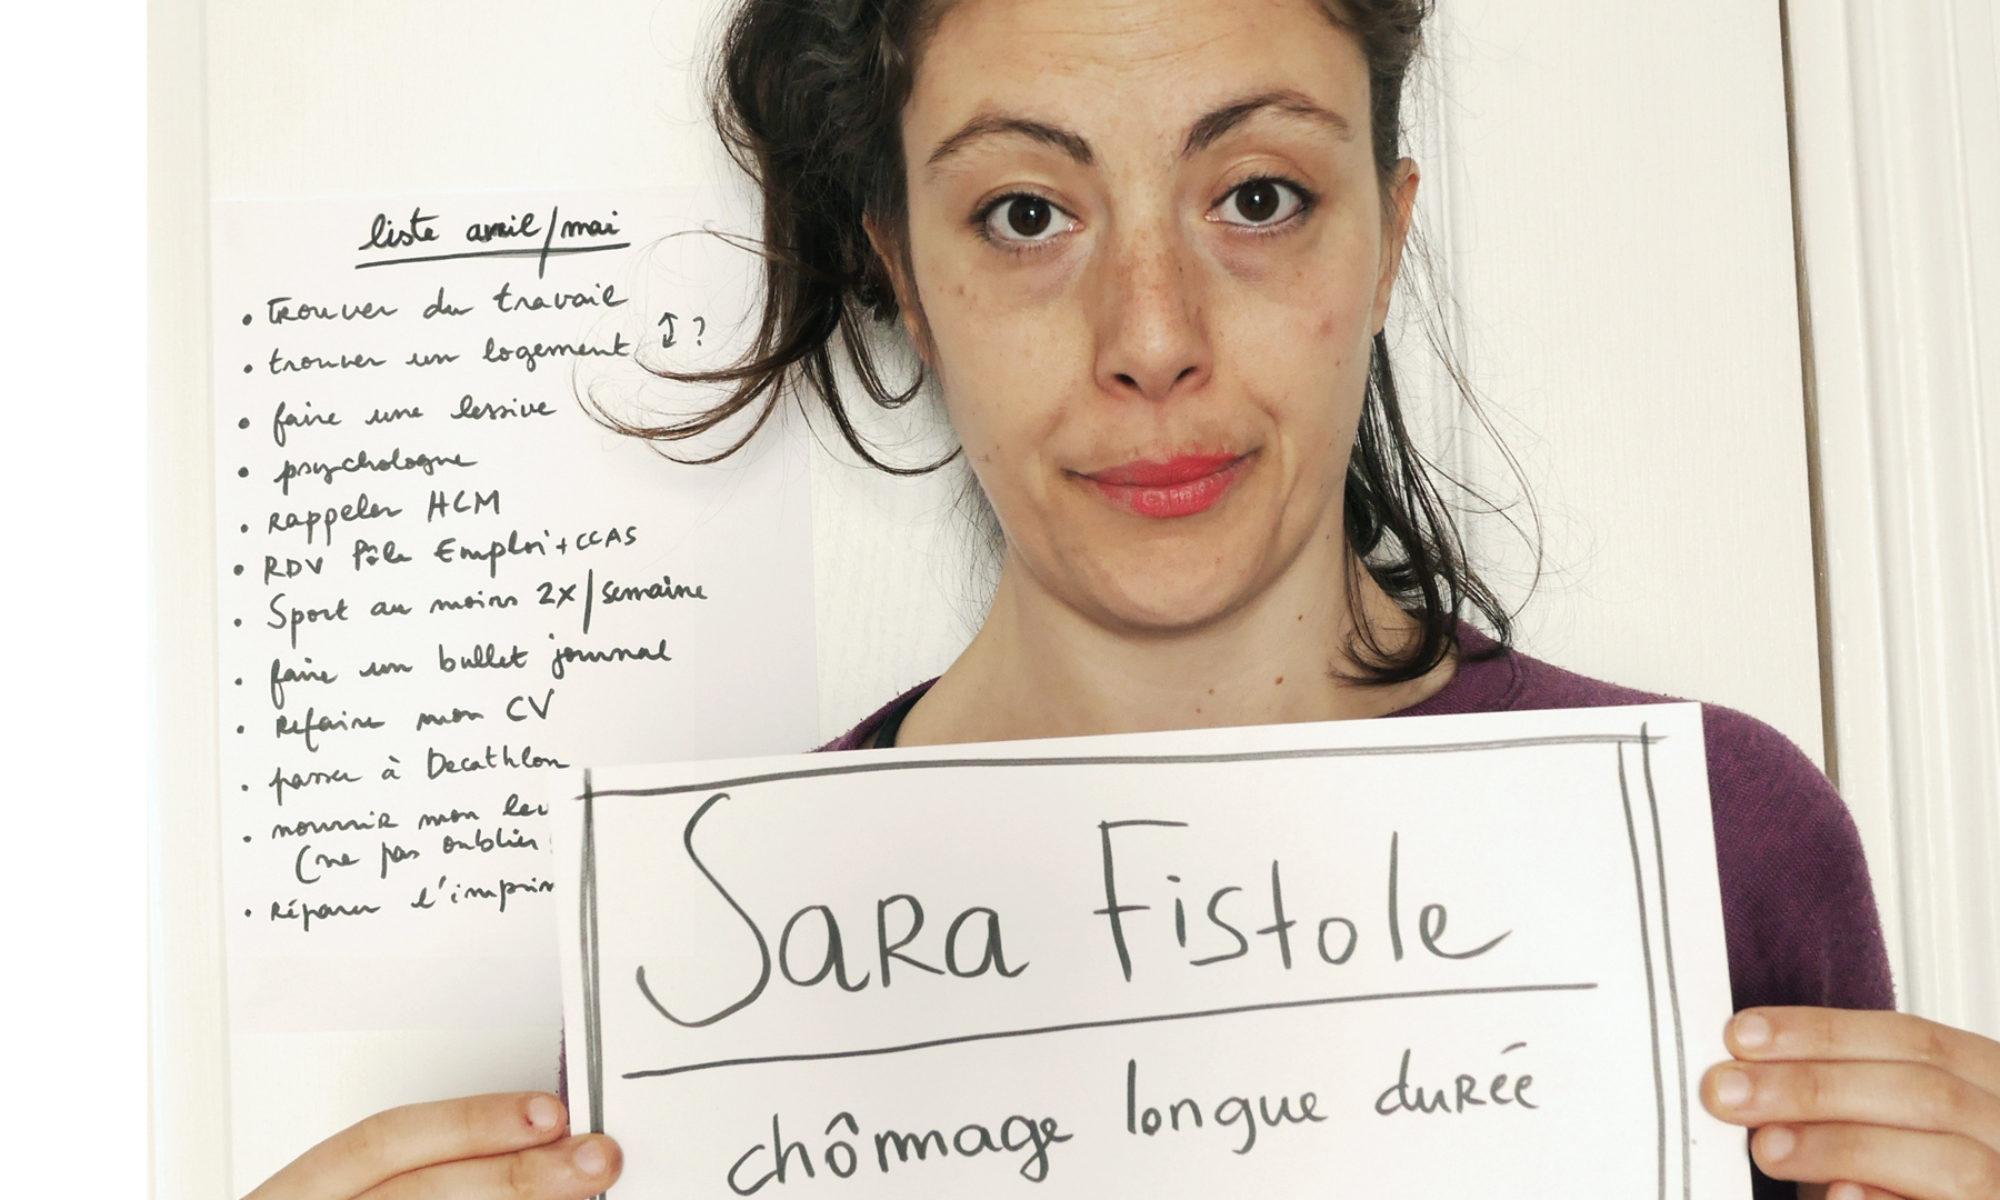 Les lettres de Sara Fistole